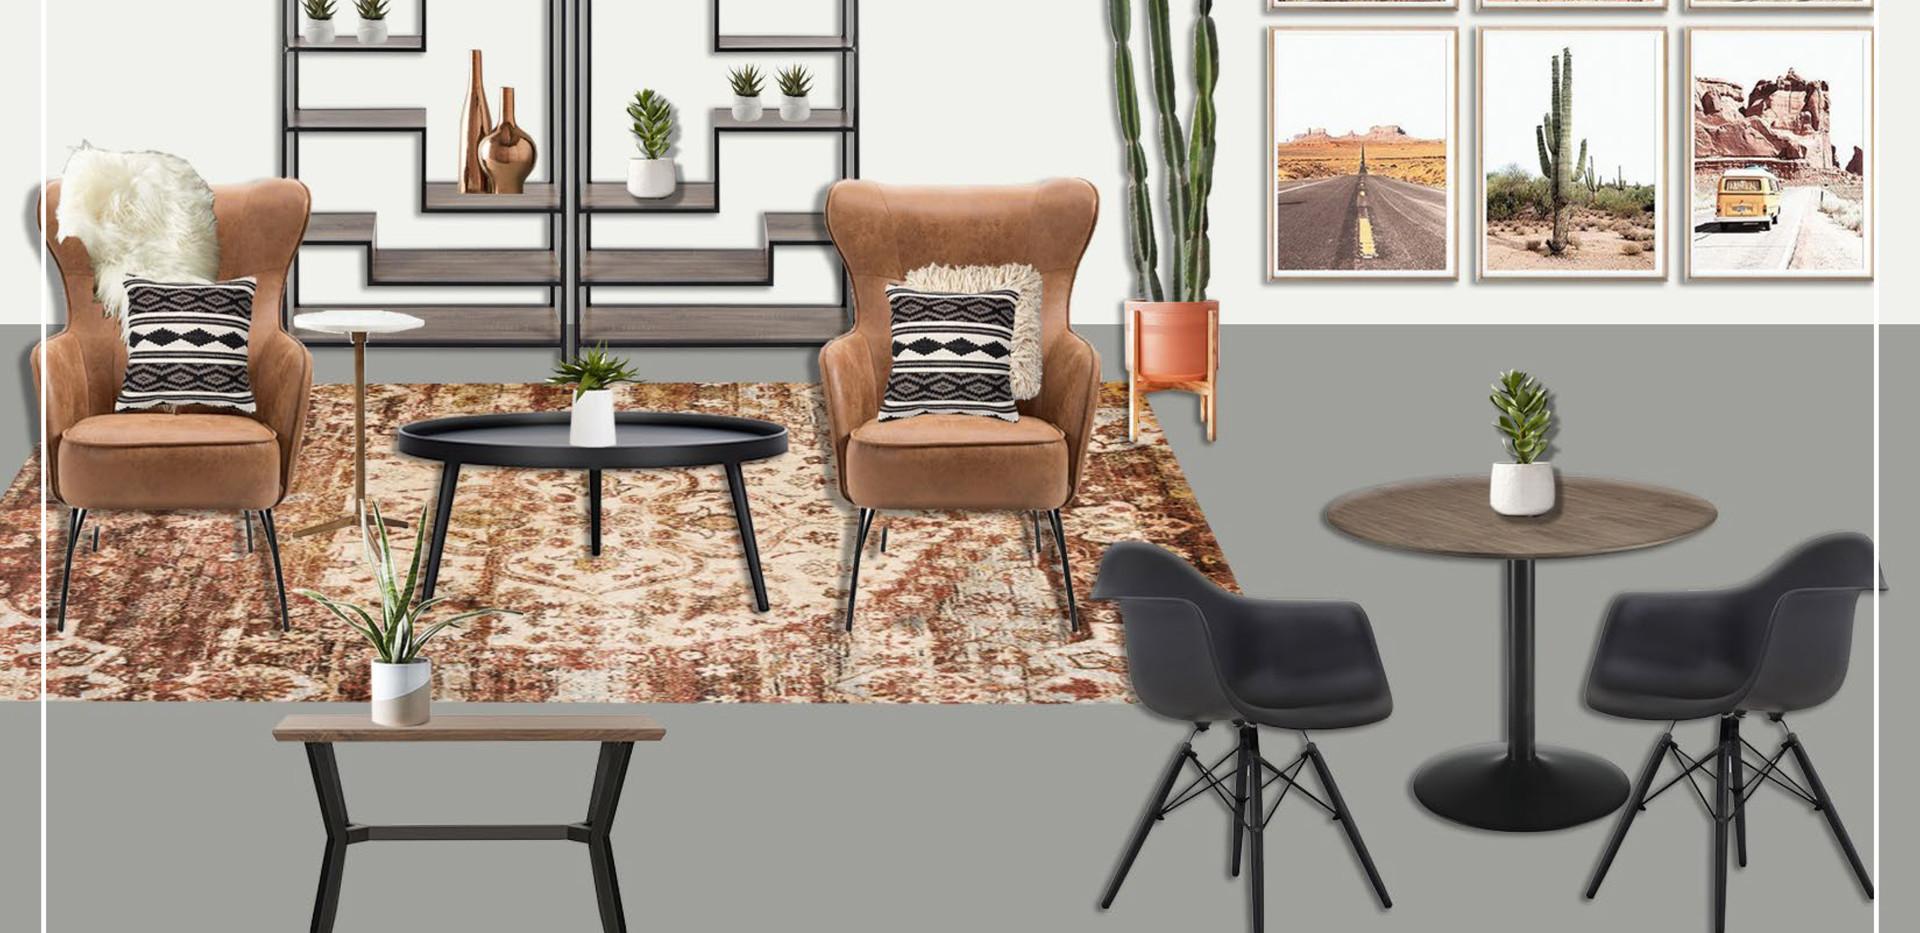 Great Room | Original Concept Collage